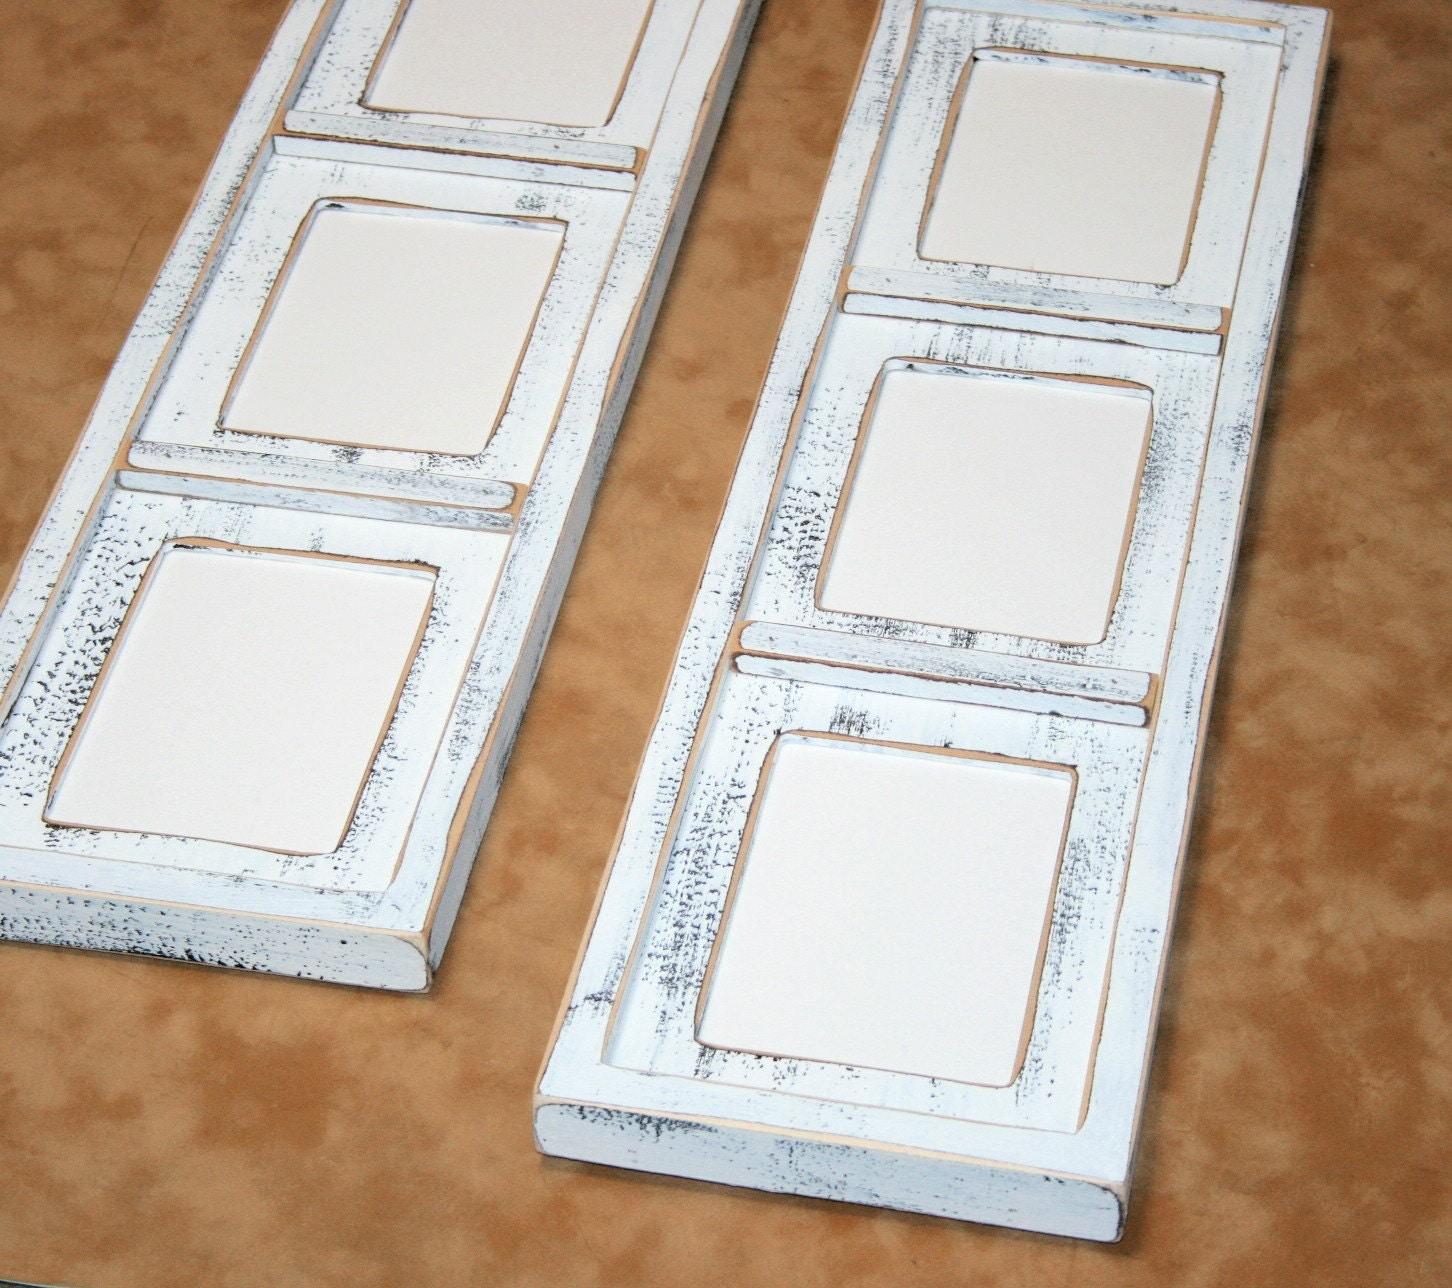 3 opening 4x6 frame 4x6 collage frame picture frame multi. Black Bedroom Furniture Sets. Home Design Ideas